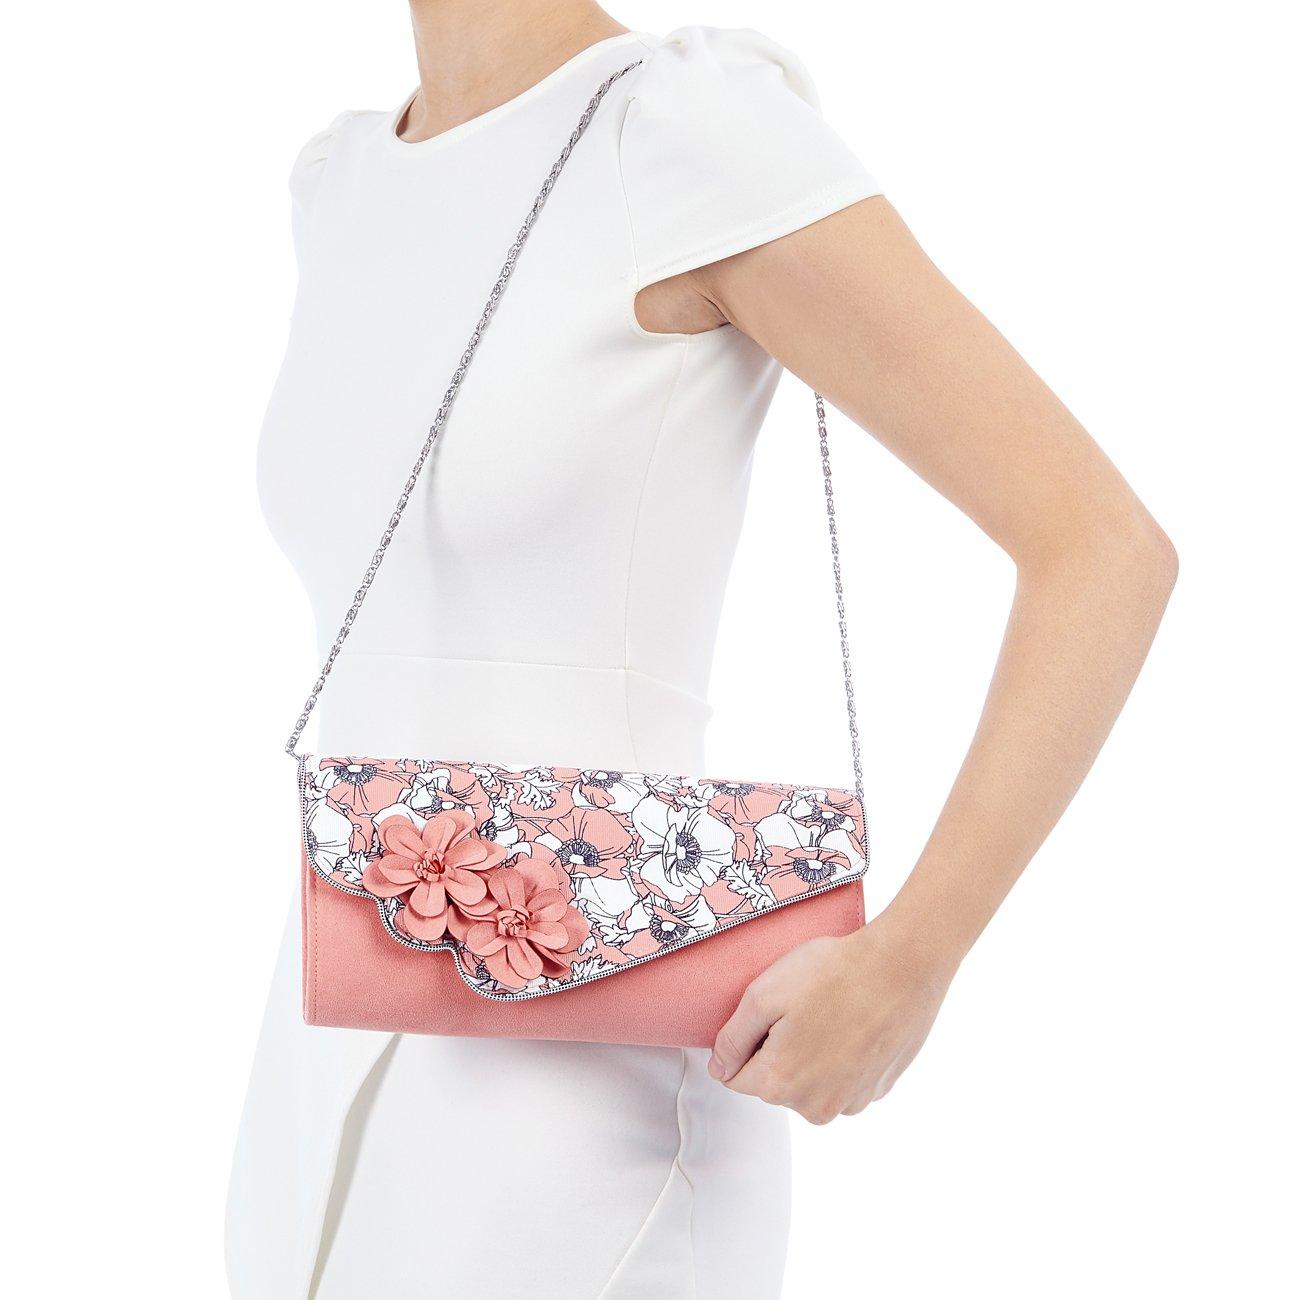 Ruby Shoo Women's Peach Floral Heidi Fabric Slingback Pumps & Rio Bag UK 5 EU 38 by Ruby Shoo (Image #7)